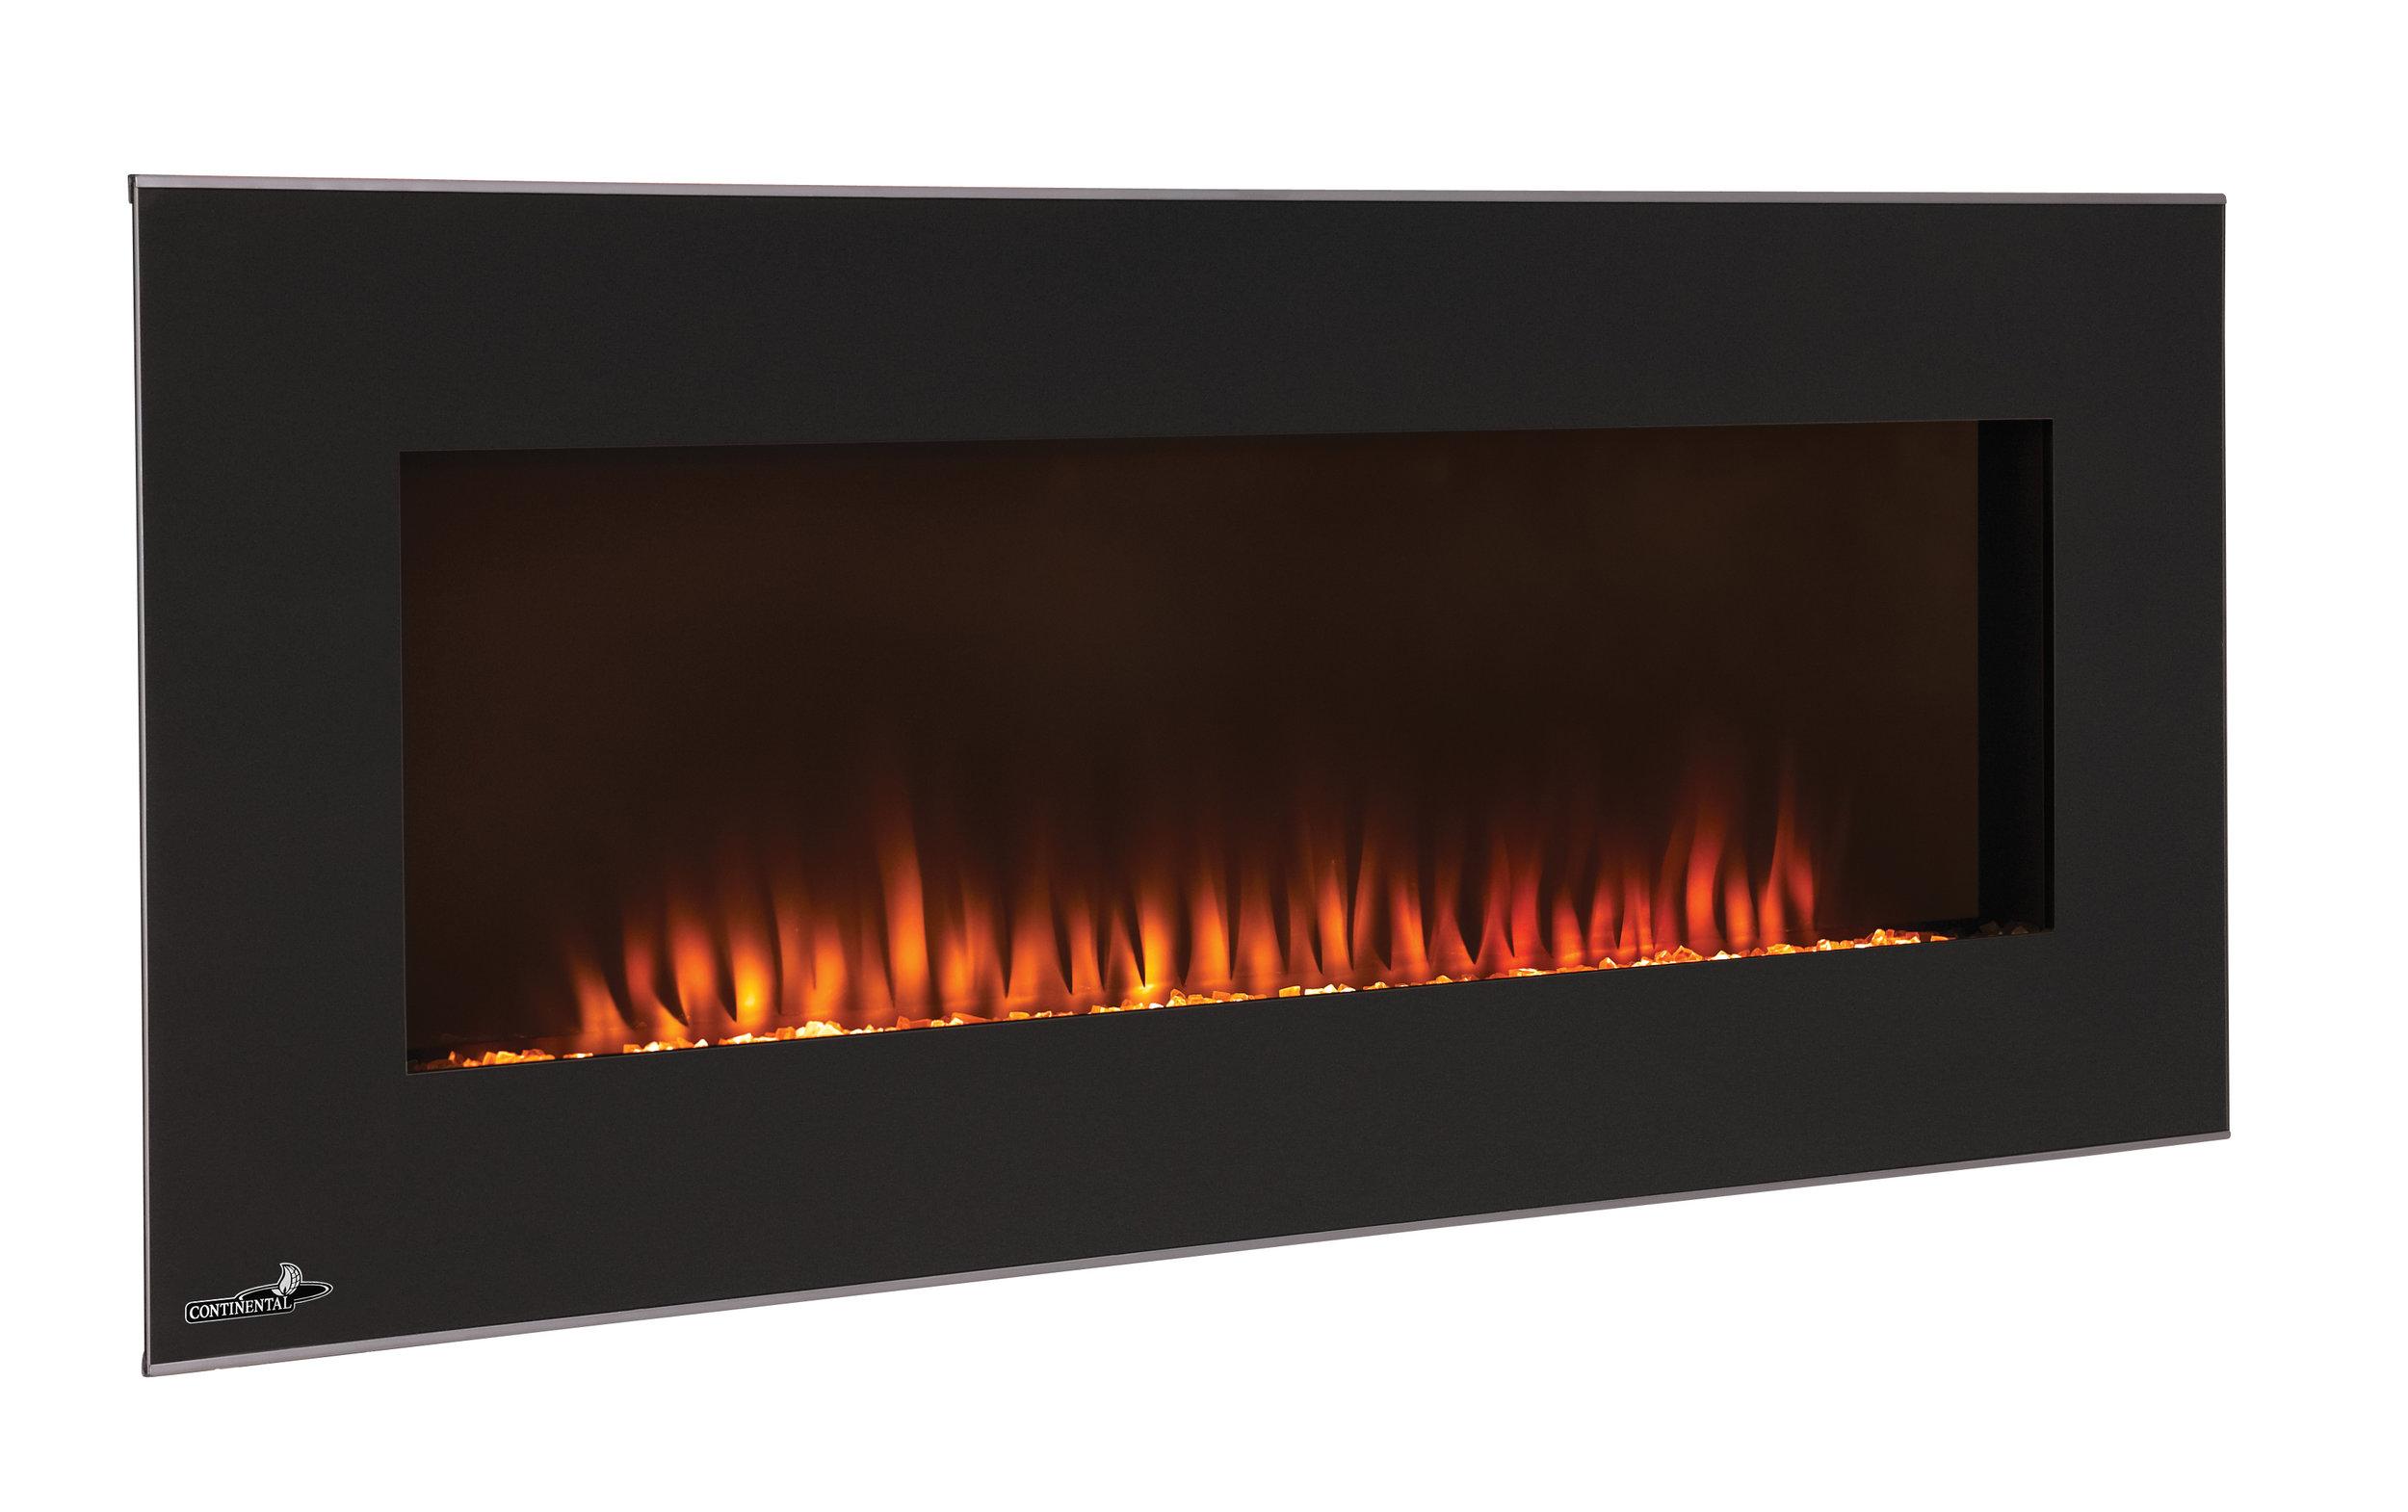 CFL42H-Angle-orange-continental-fireplaces.jpg